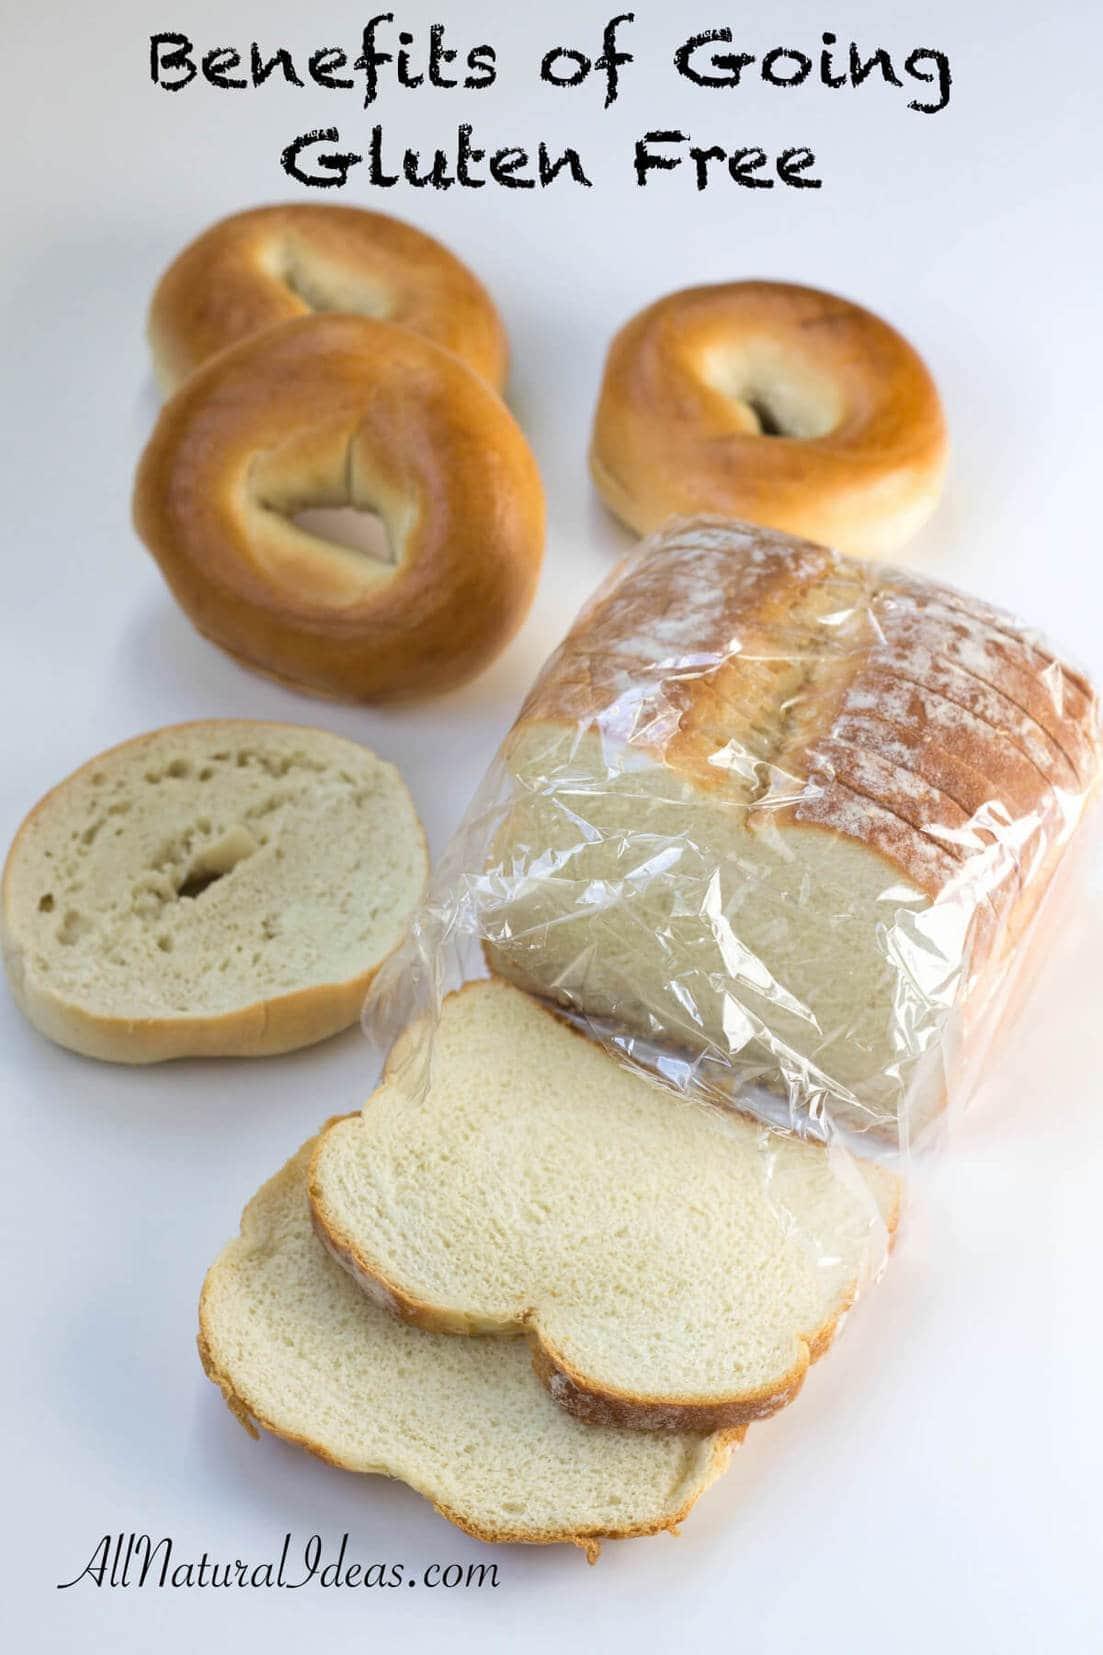 Benefits of Going Gluten-Free in Your Diet